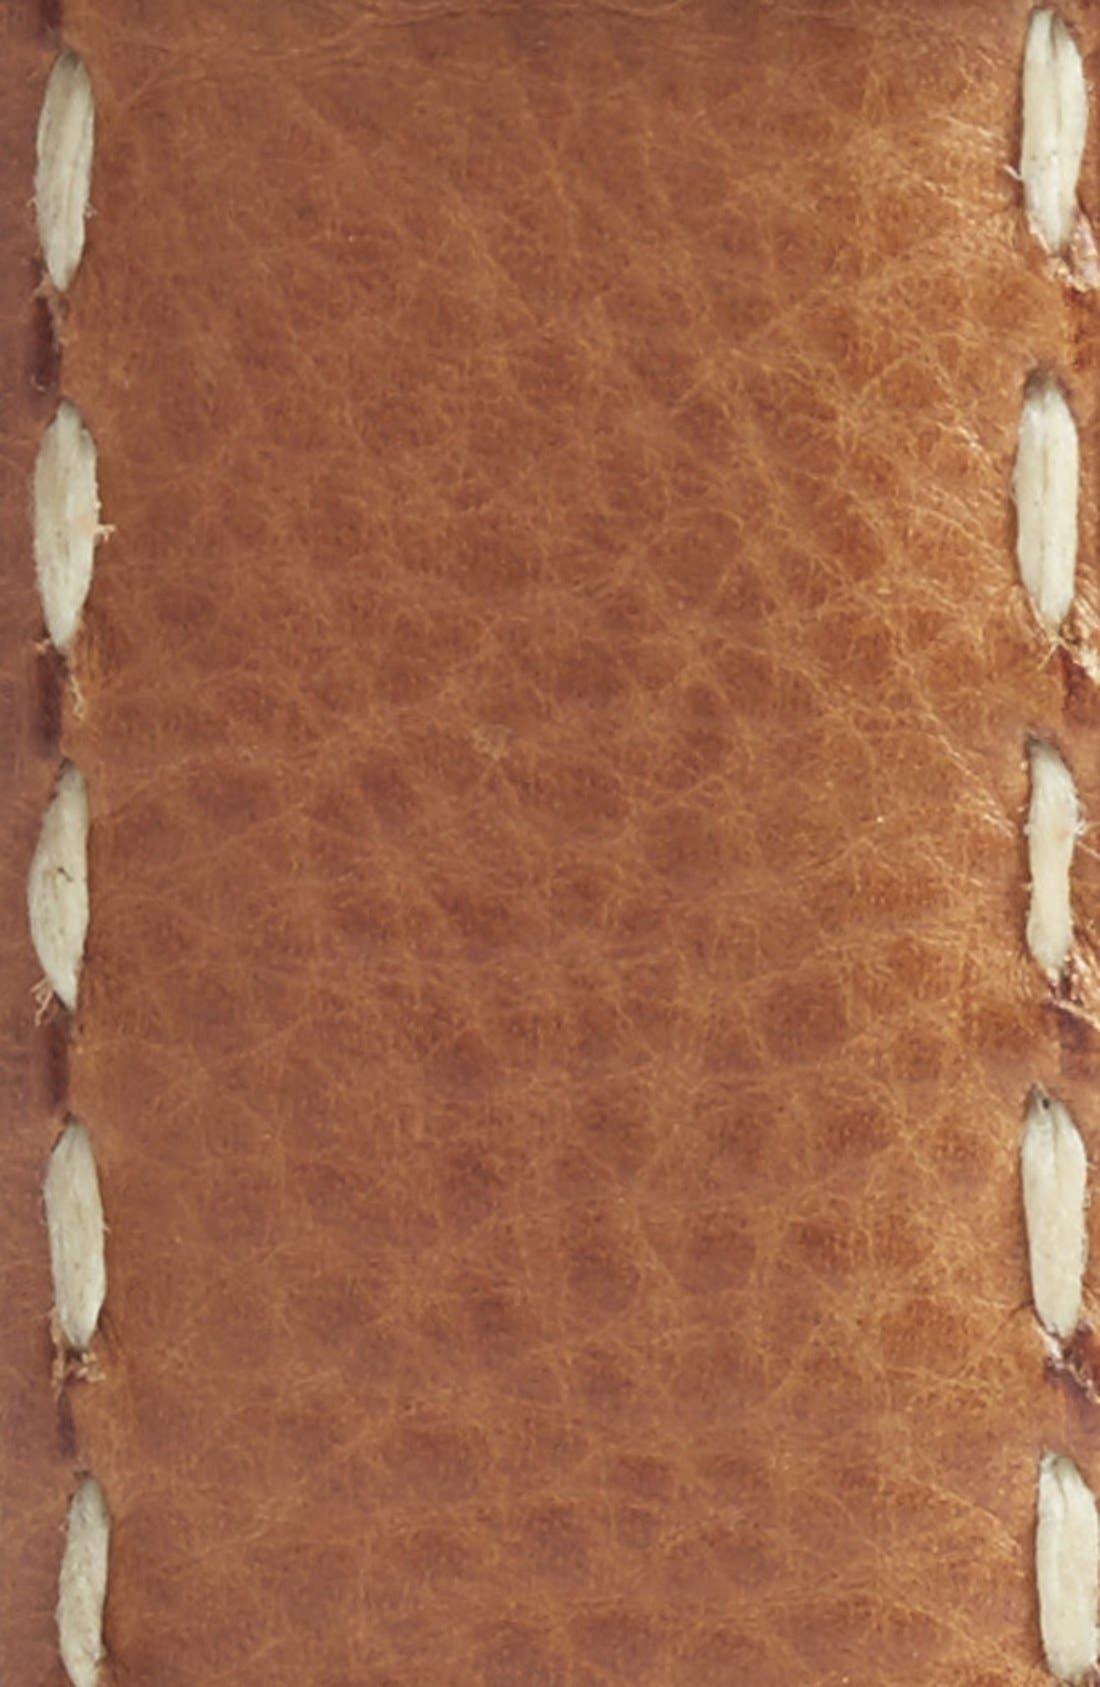 Alternate Image 2  - Torino Belts Calfskin Leather Belt